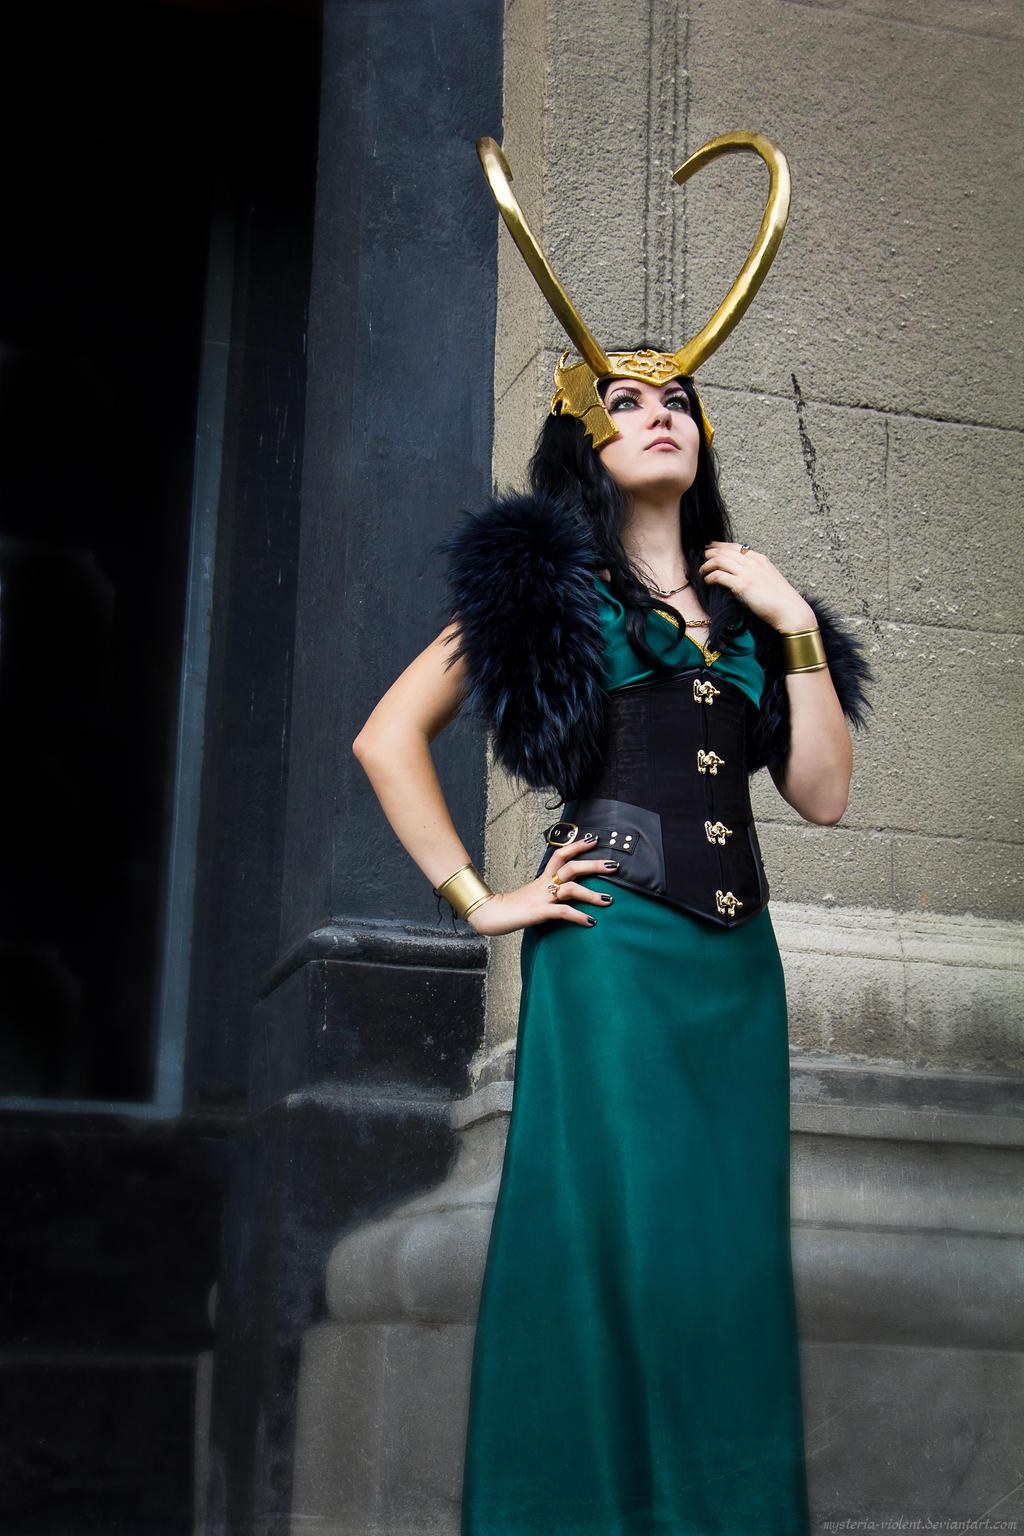 Goddess of Mischief by mysteria-violent